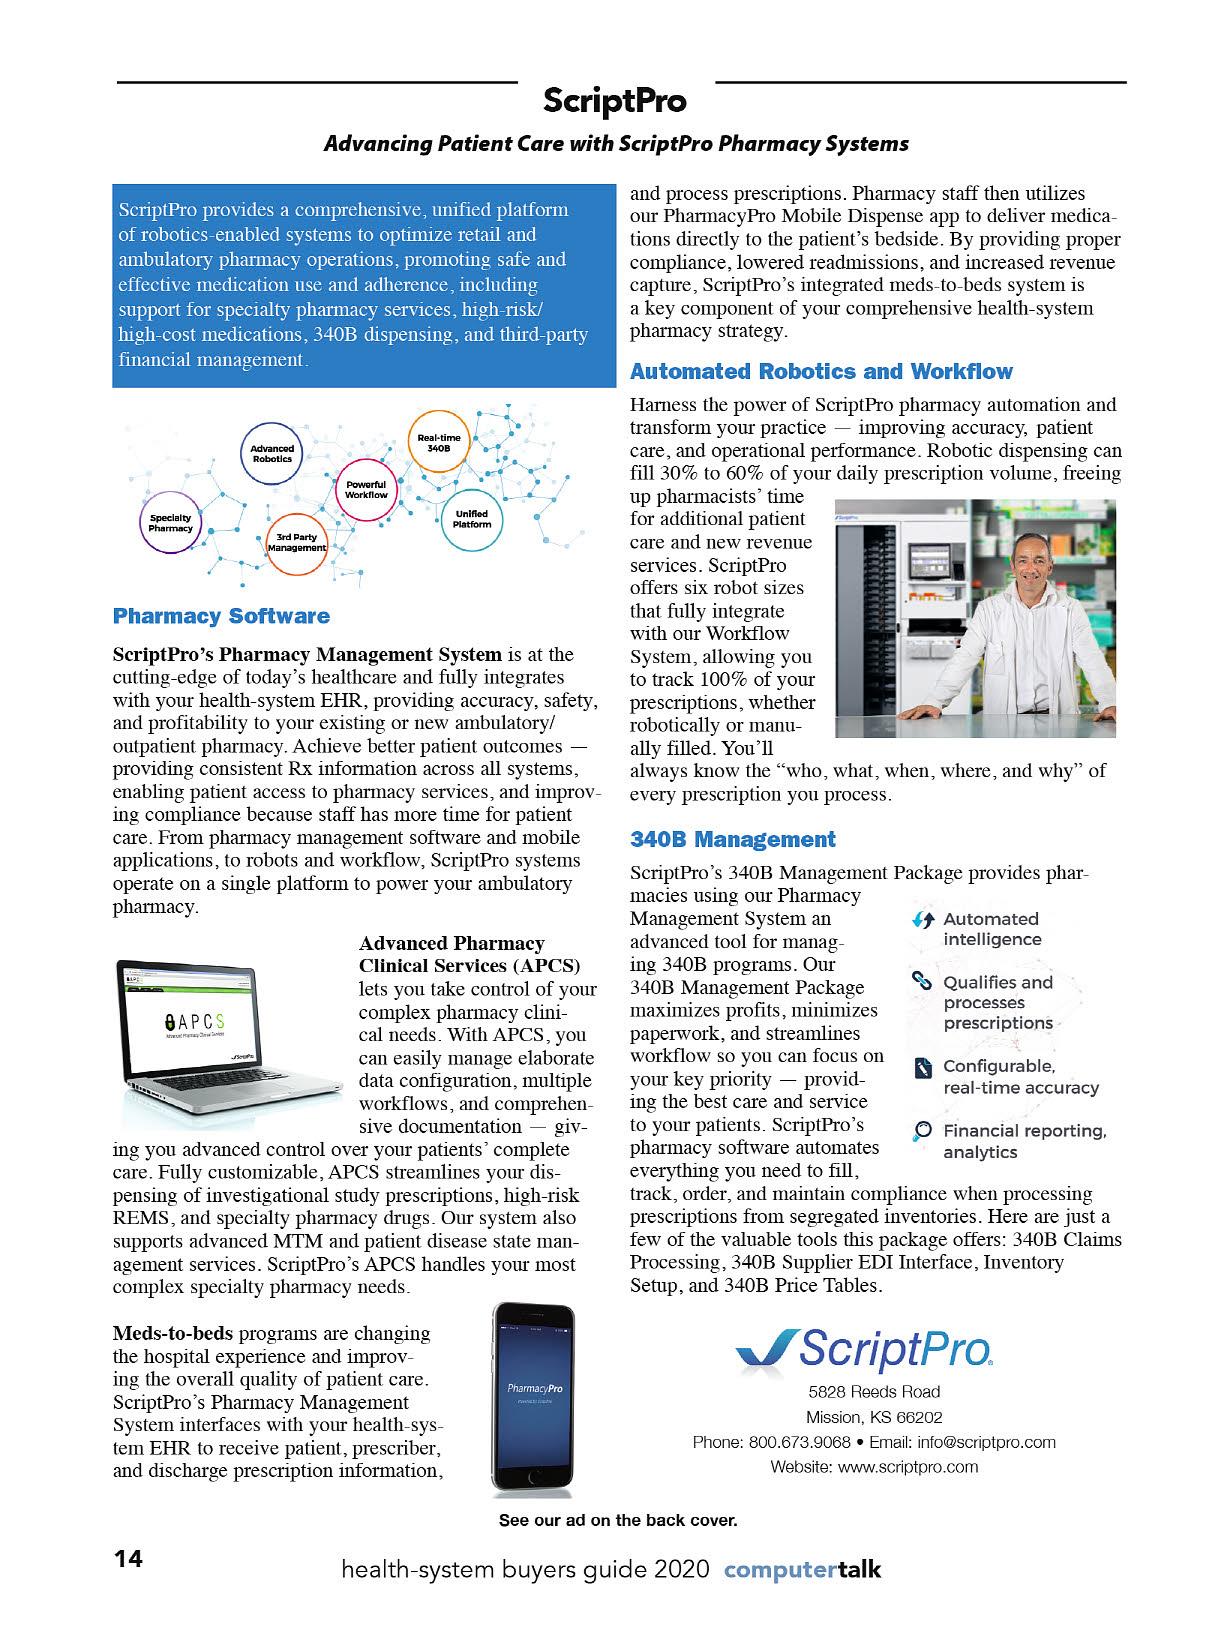 ComputerTalk_Health-System_Buyers_Guide_2020_ScriptPro